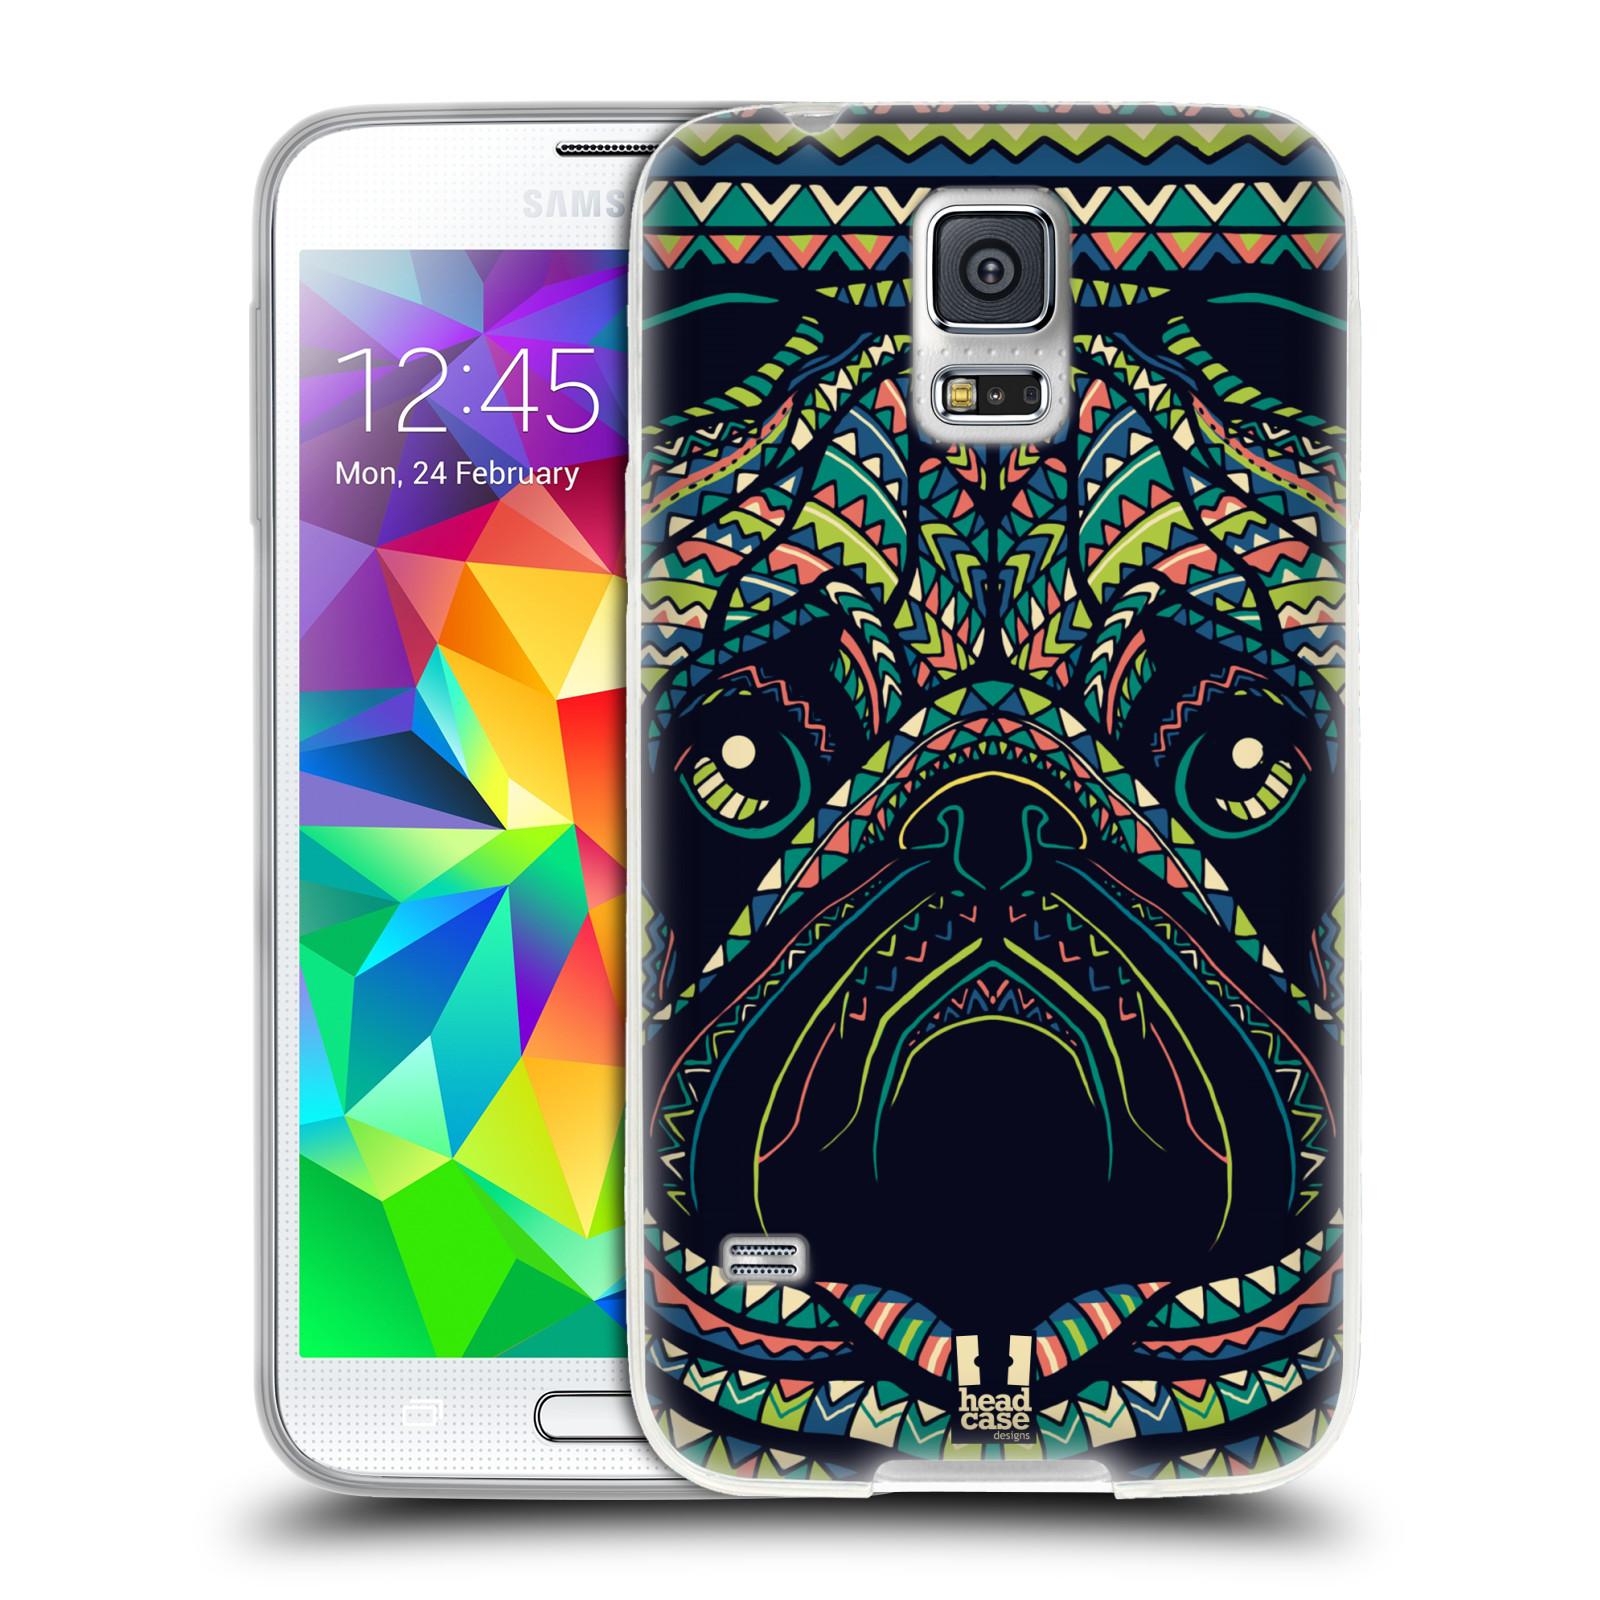 HEAD CASE silikonový obal na mobil Samsung Galaxy S5/S5 NEO vzor Aztécký motiv zvíře 3 mopsík